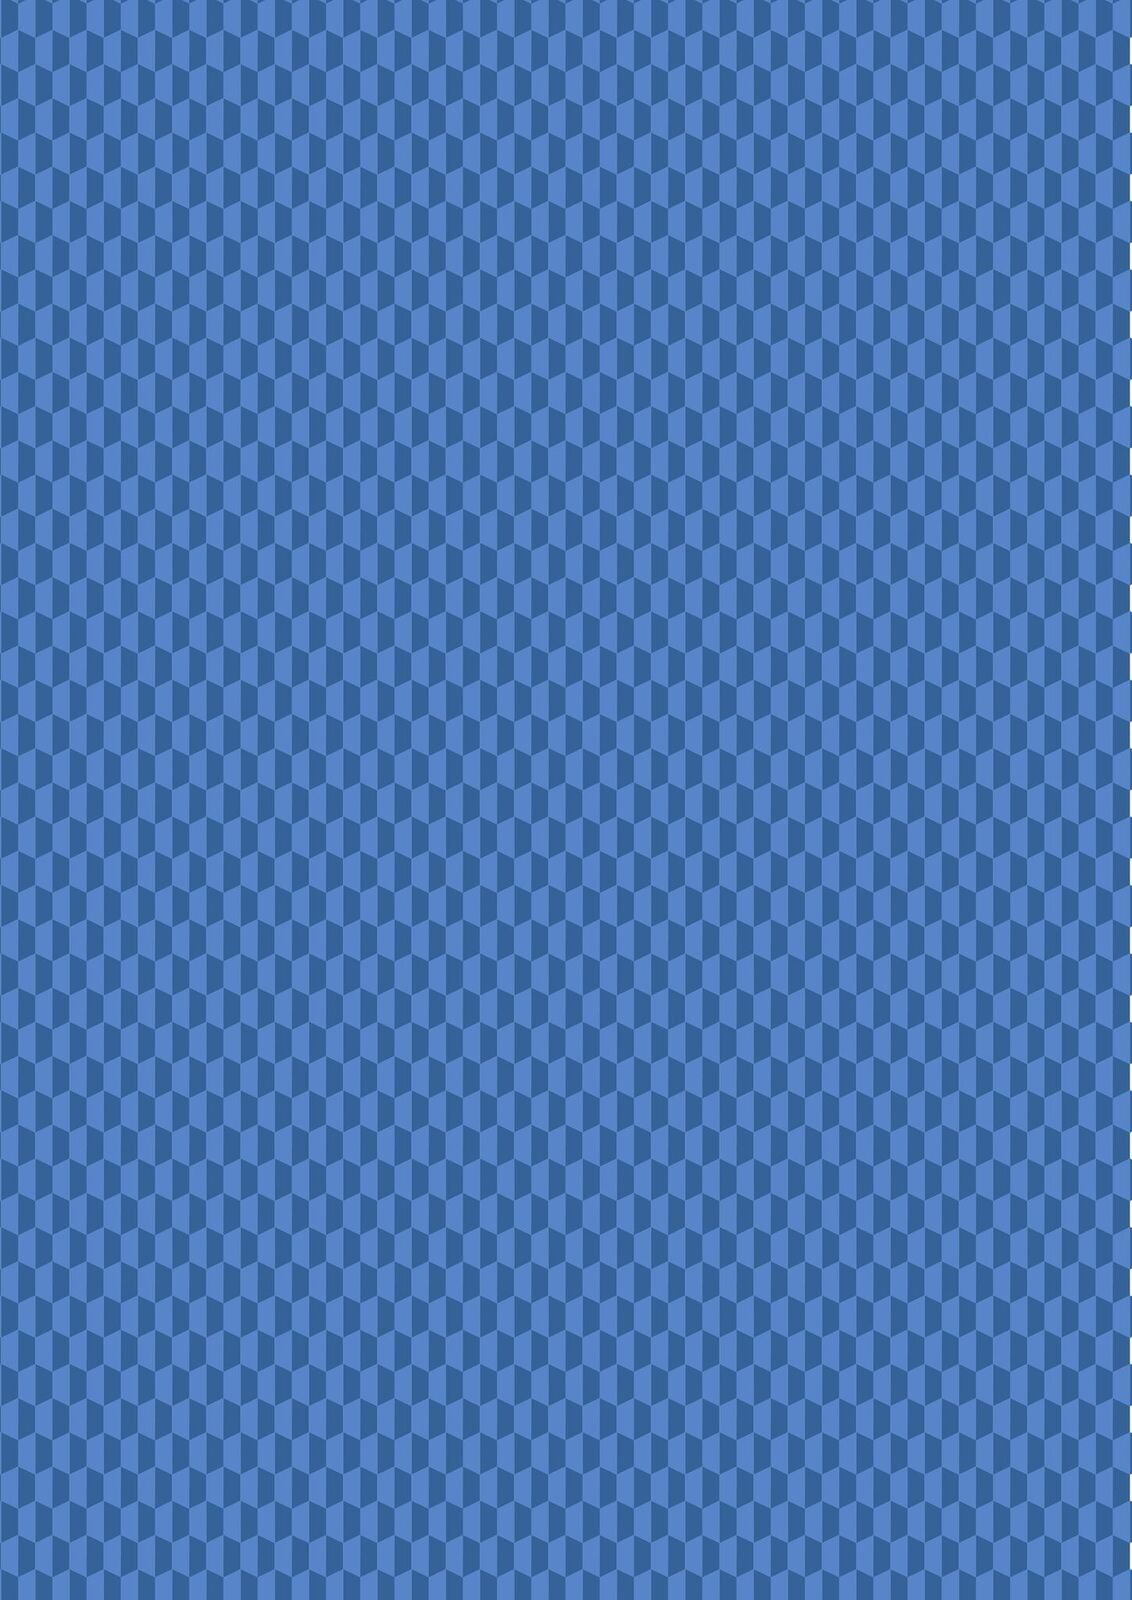 Lewis & Irene Geometrix - Blue Hex- GX4.4